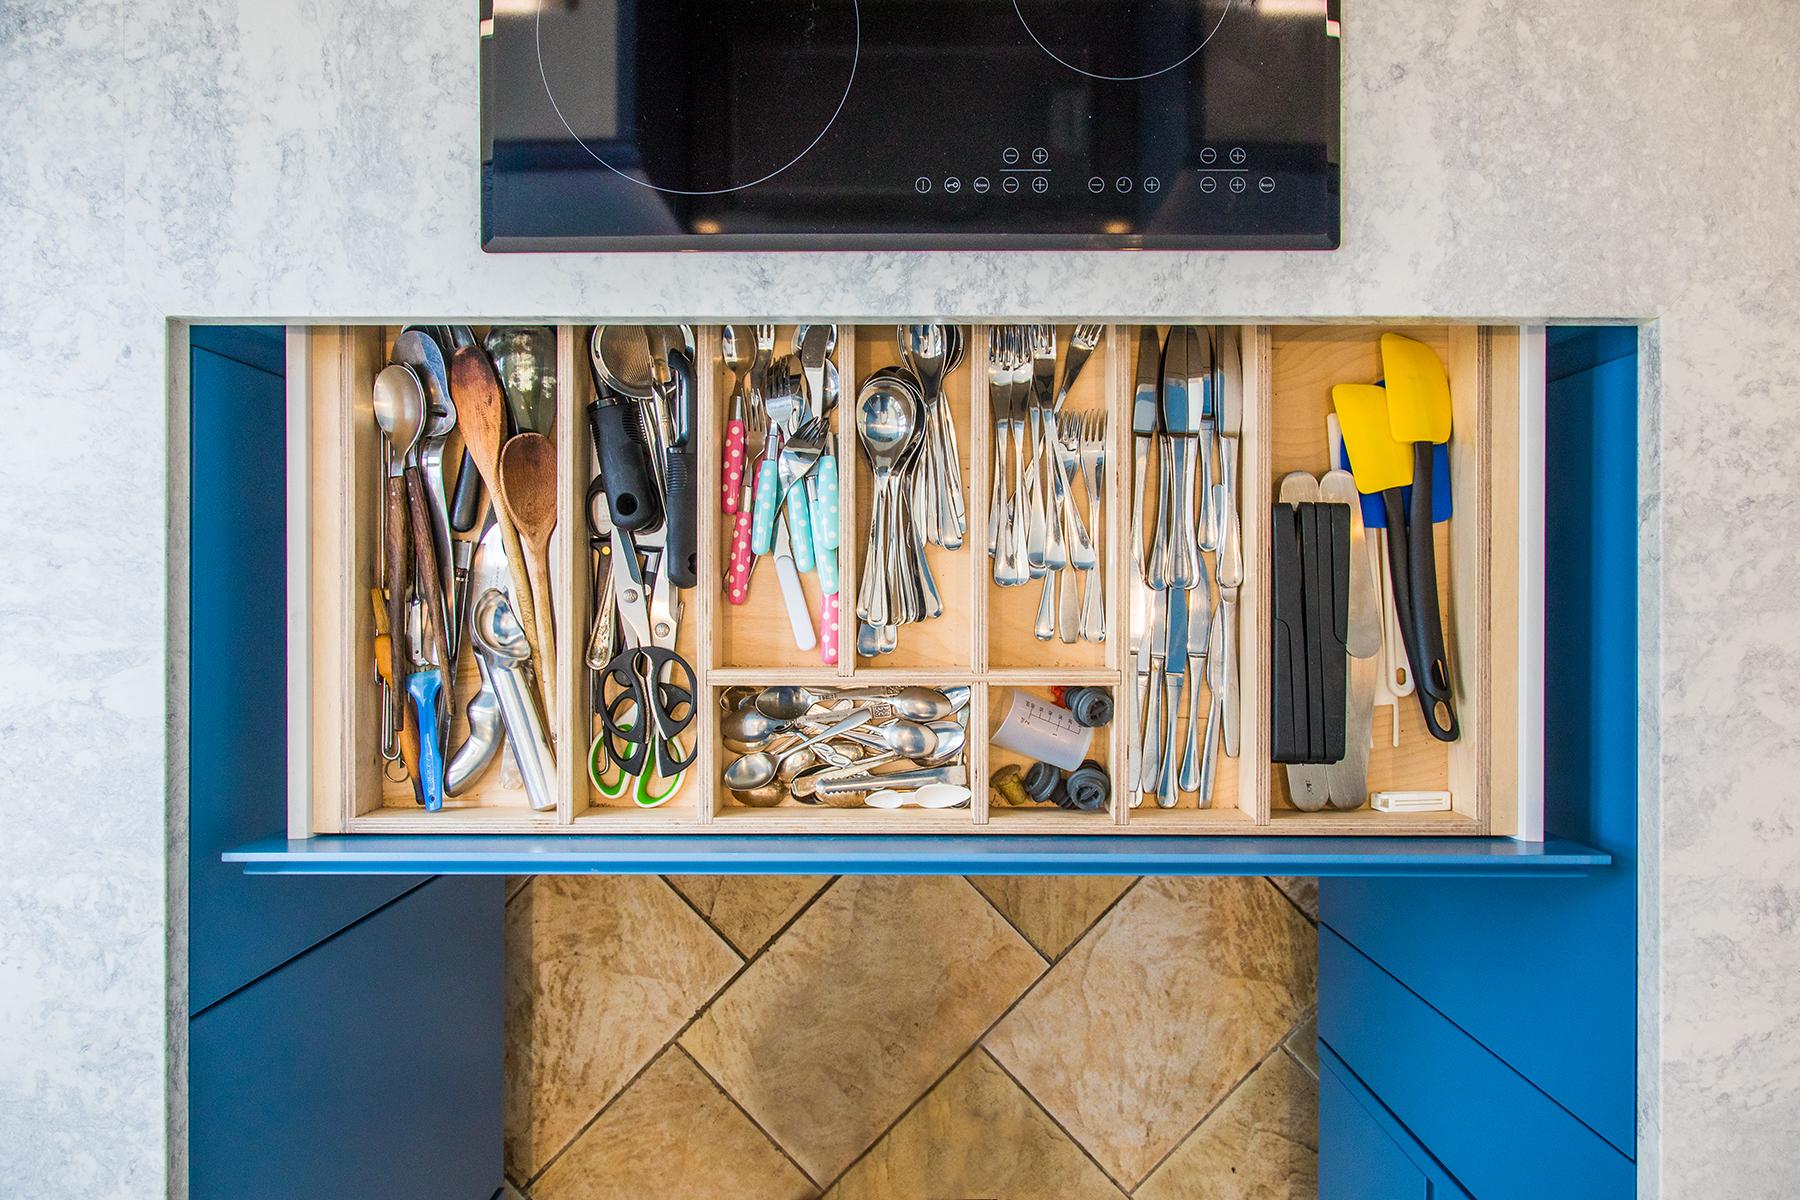 kitchen photography, kitchen, sheffield, interiors, interior, blue kitchen, architectural photography